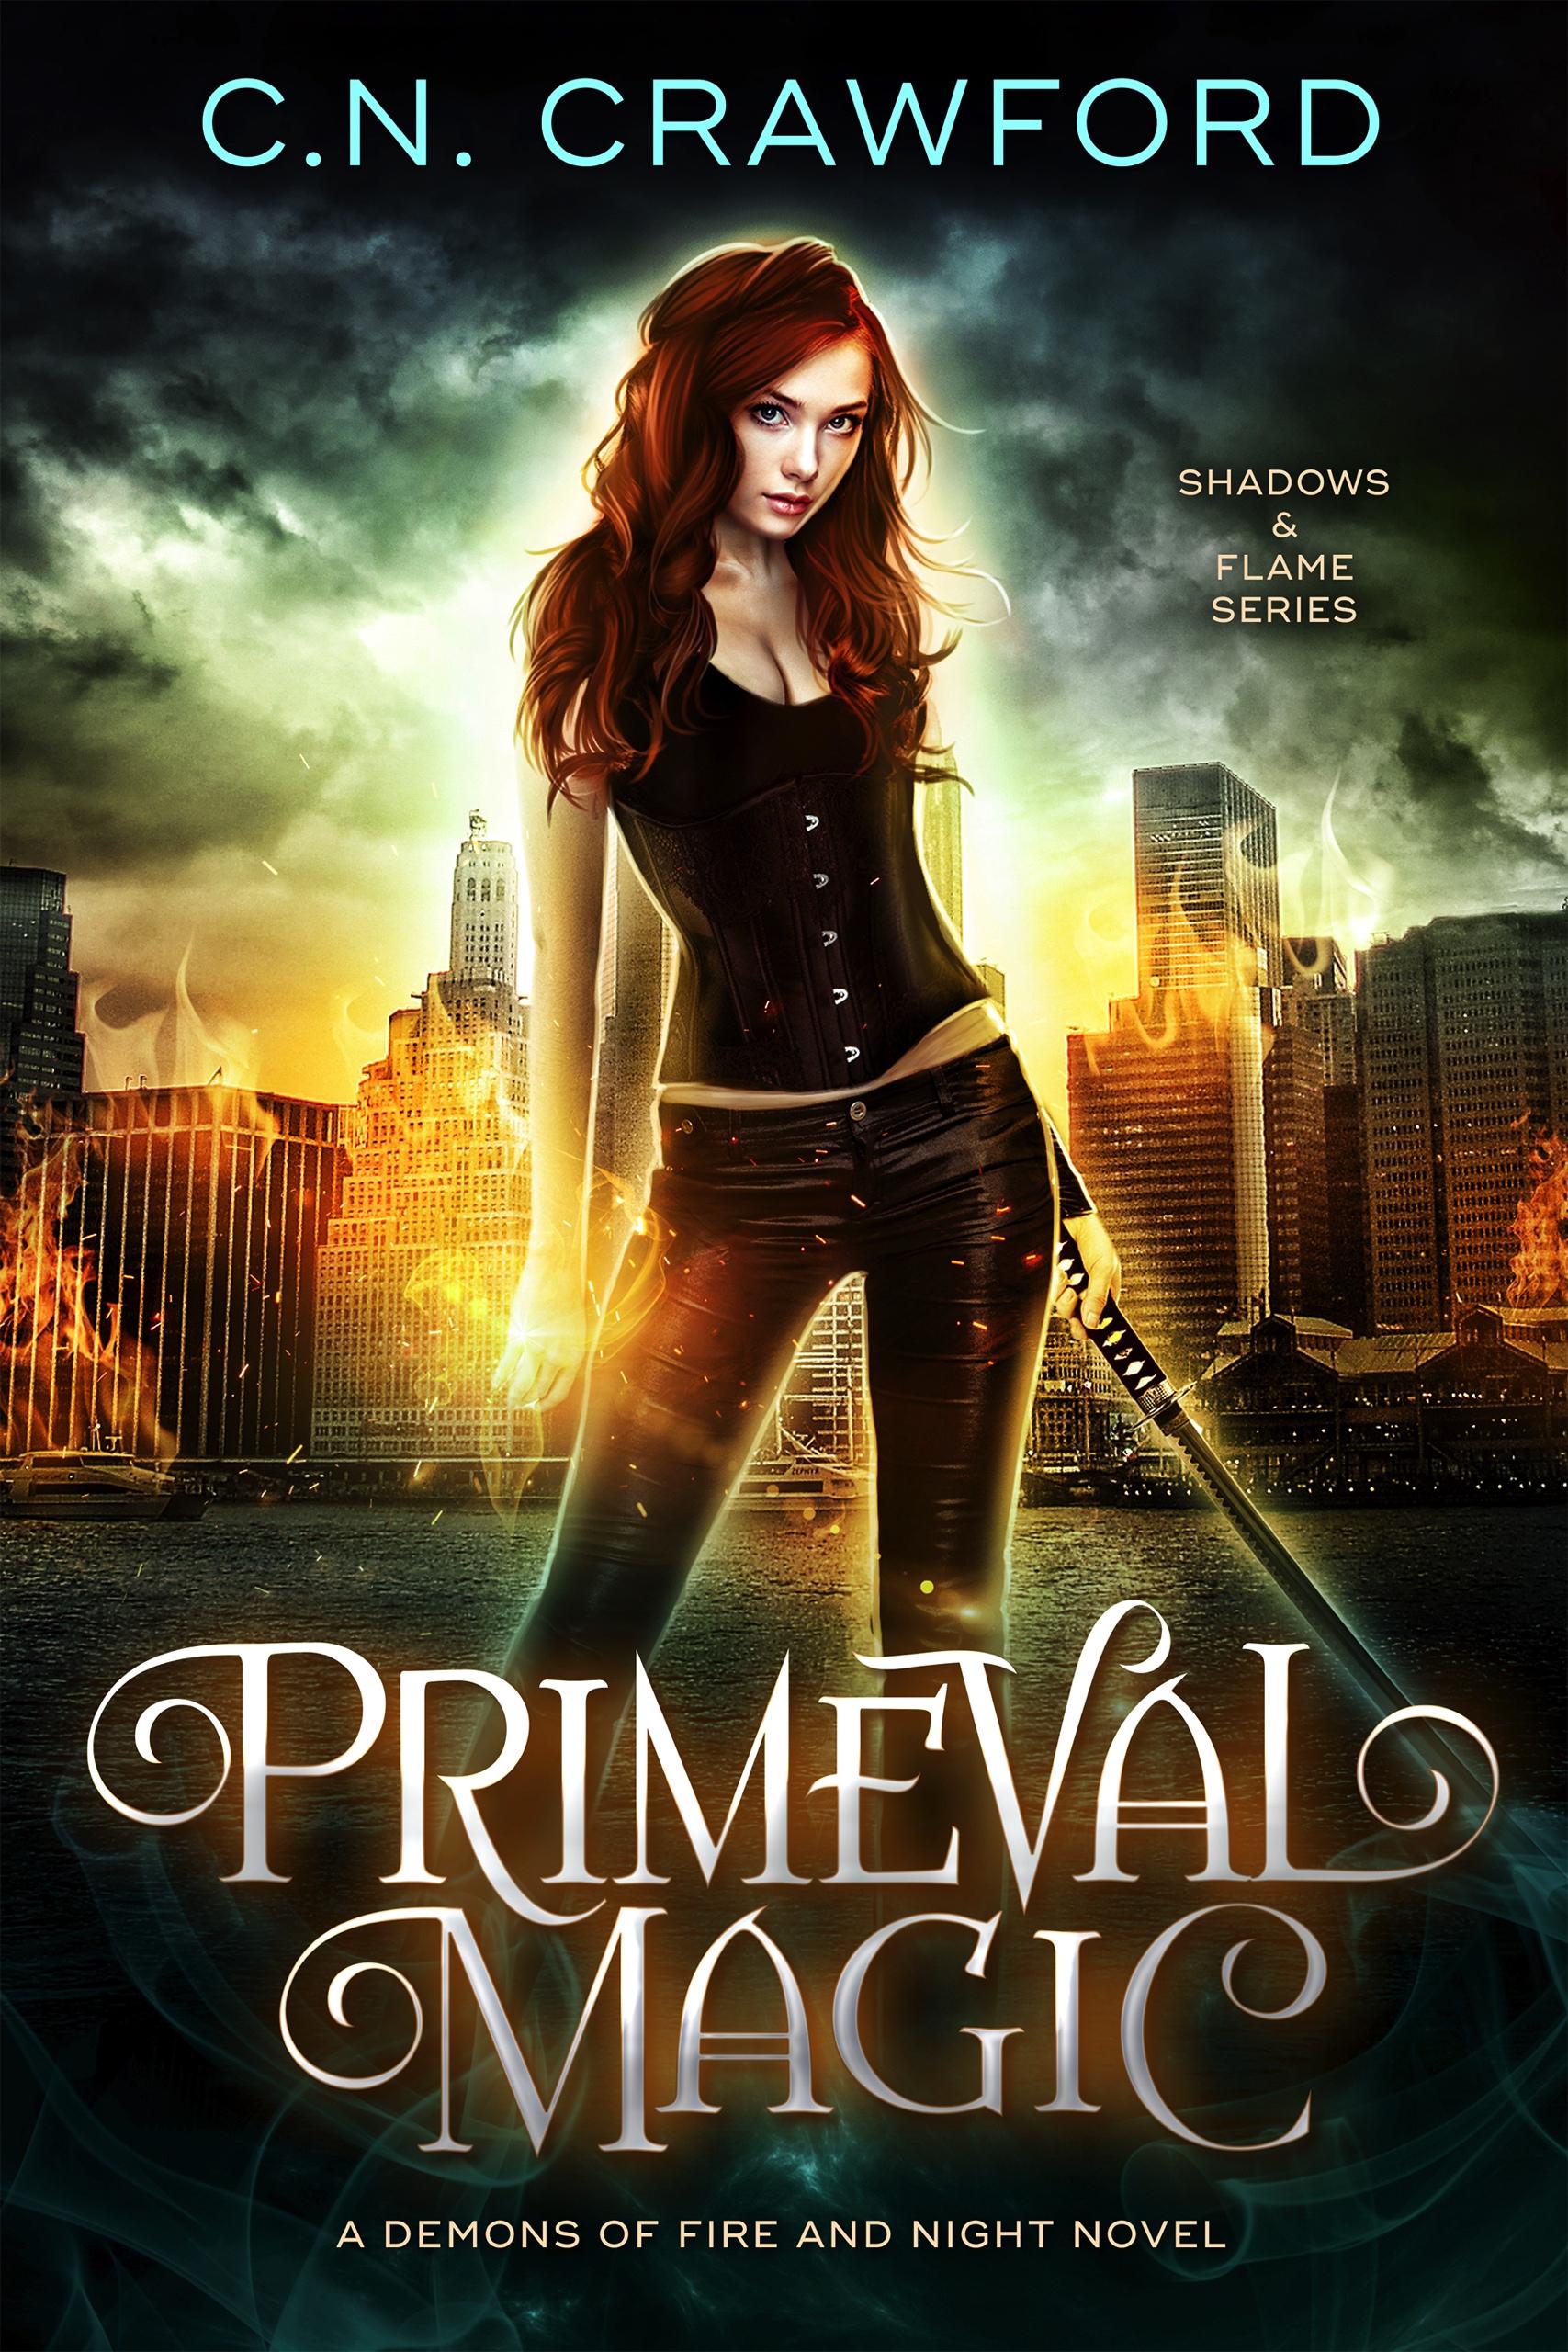 Book 3: Primeval Magic